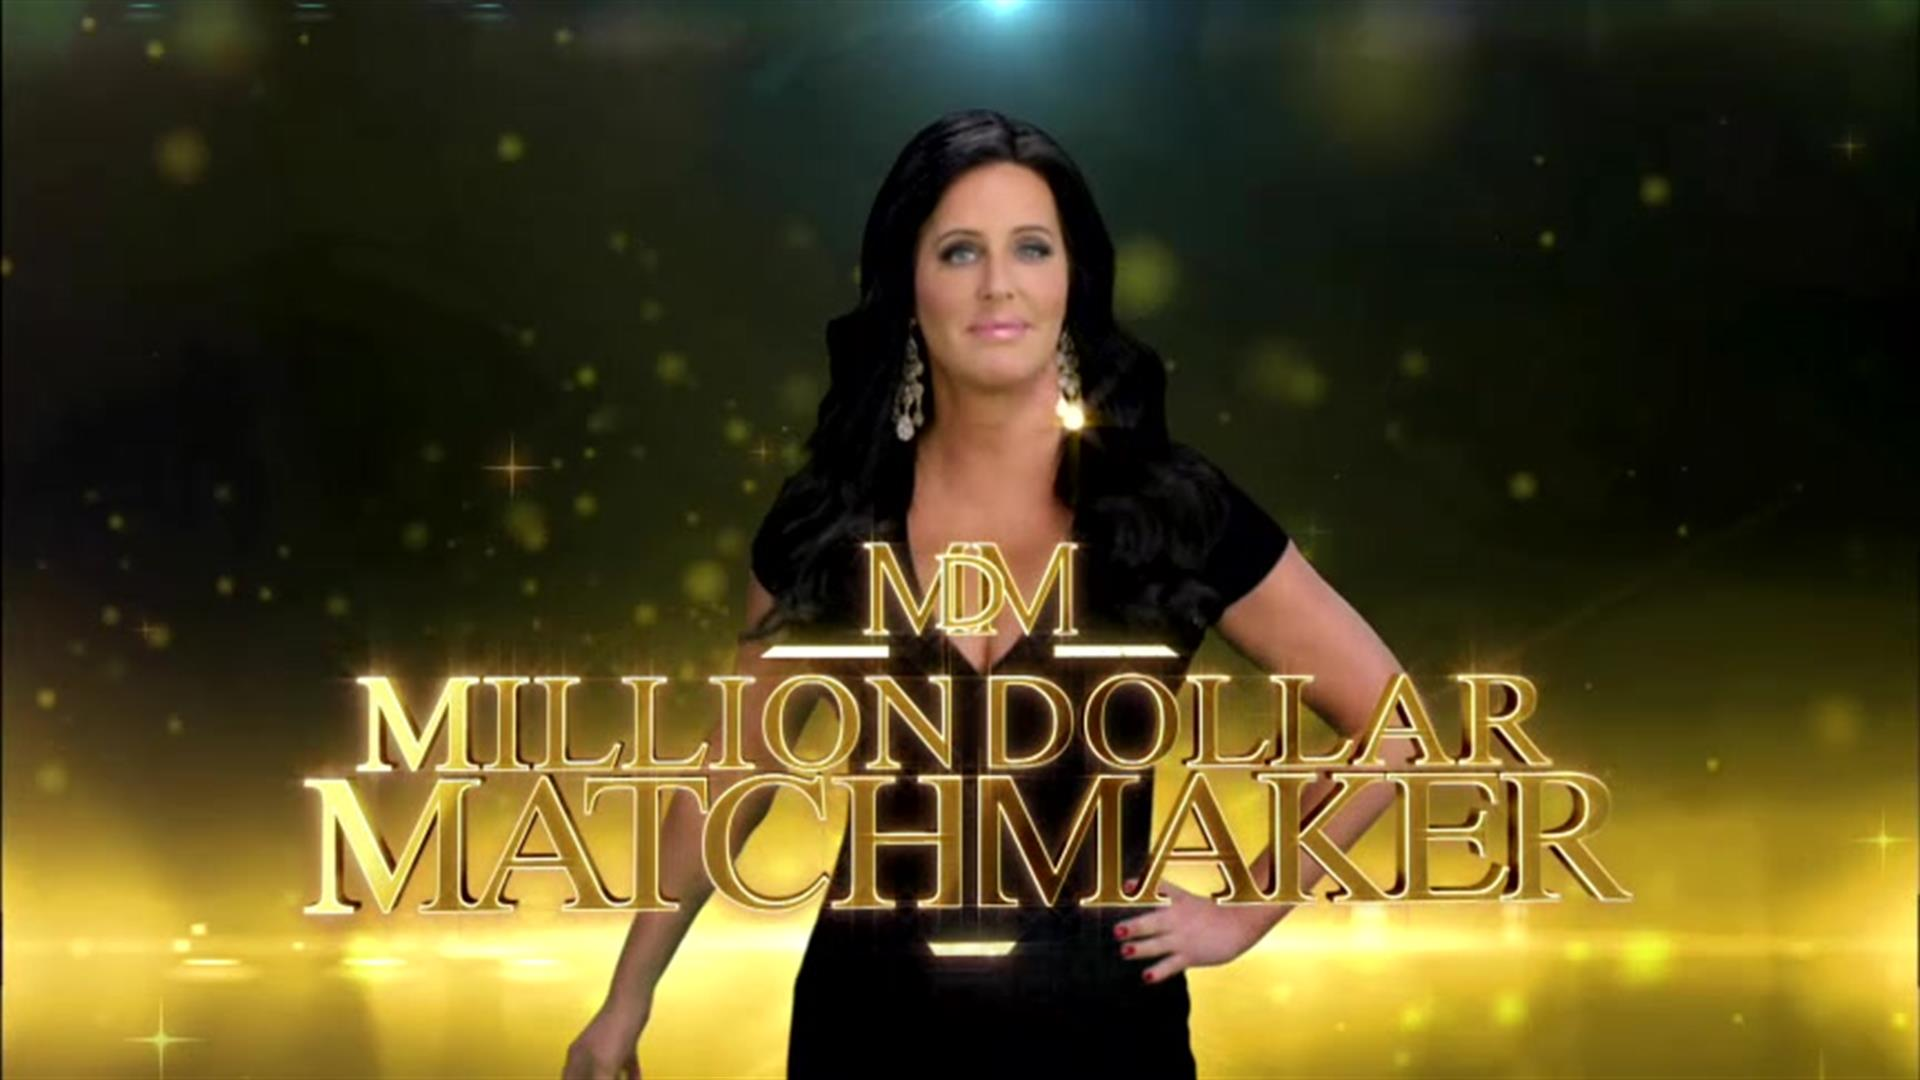 Millionaire matchmaker new episodes